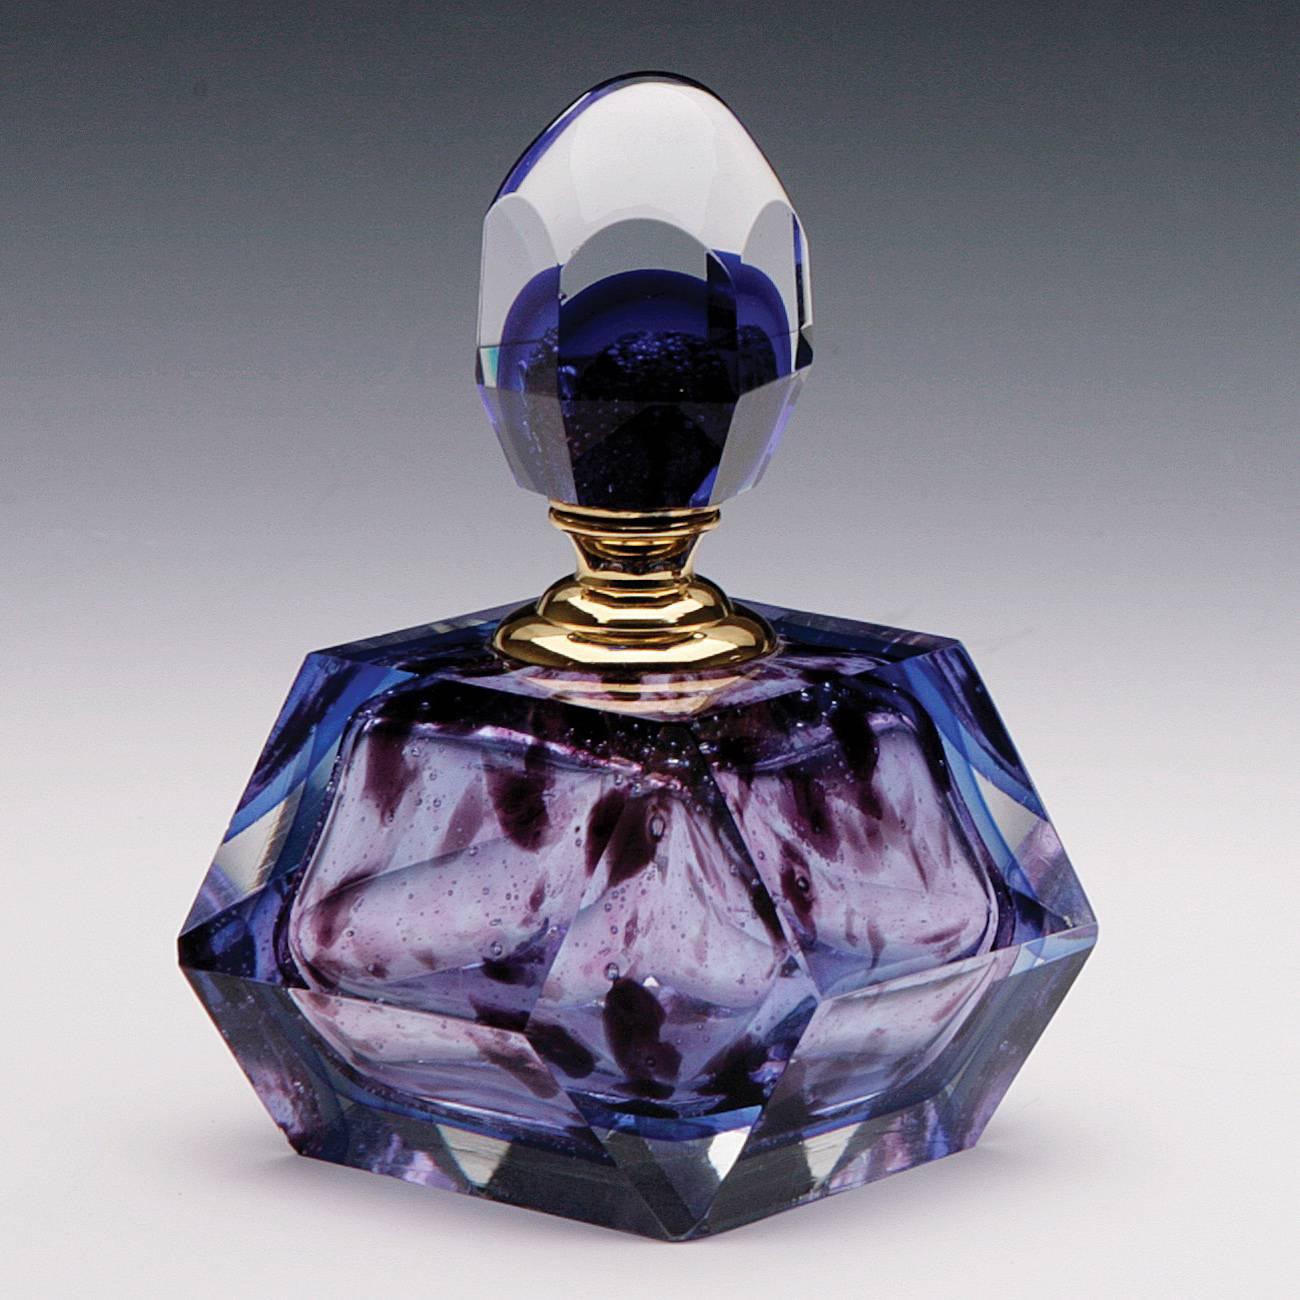 Perfumeiro Veneza Roxo em Vidro - Prestige - 12x9,5 cm